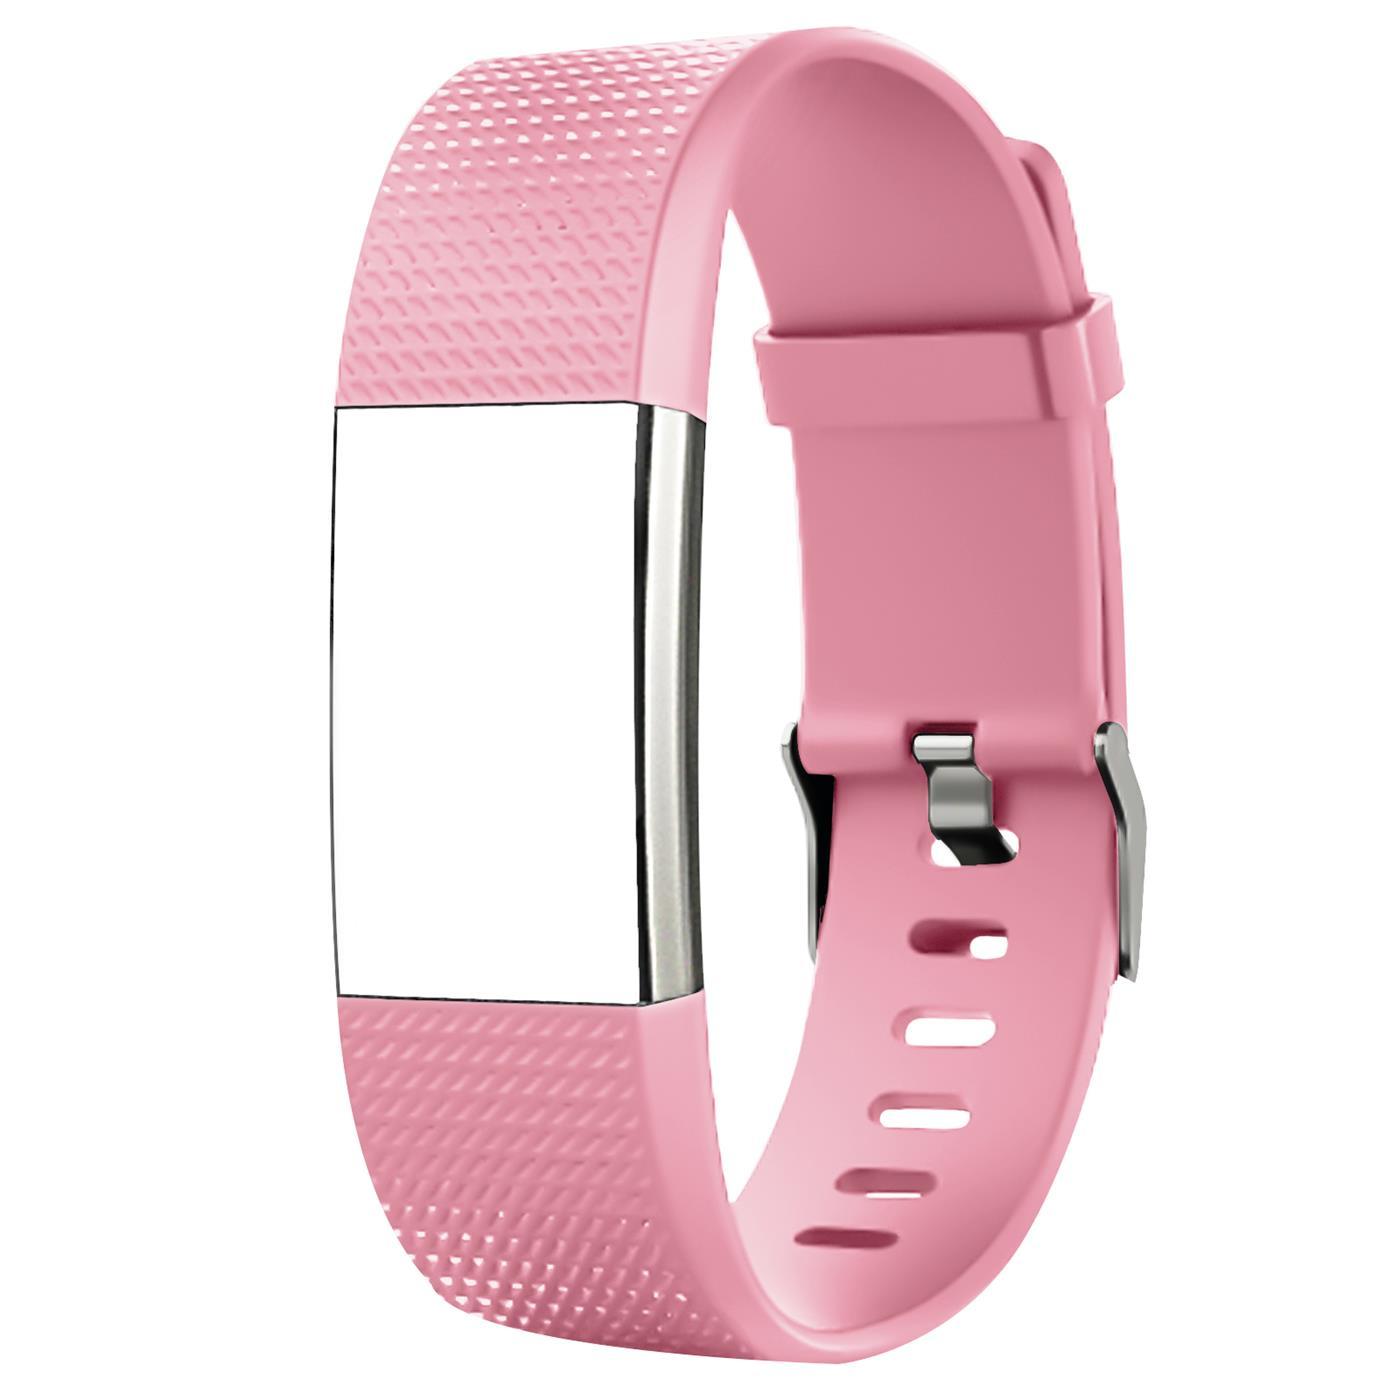 Fitbit-Groesse-S-oder-L-Ersatz-Silikon-Armband-Uhren-Sport-Band-Fitness-Tracker Indexbild 16